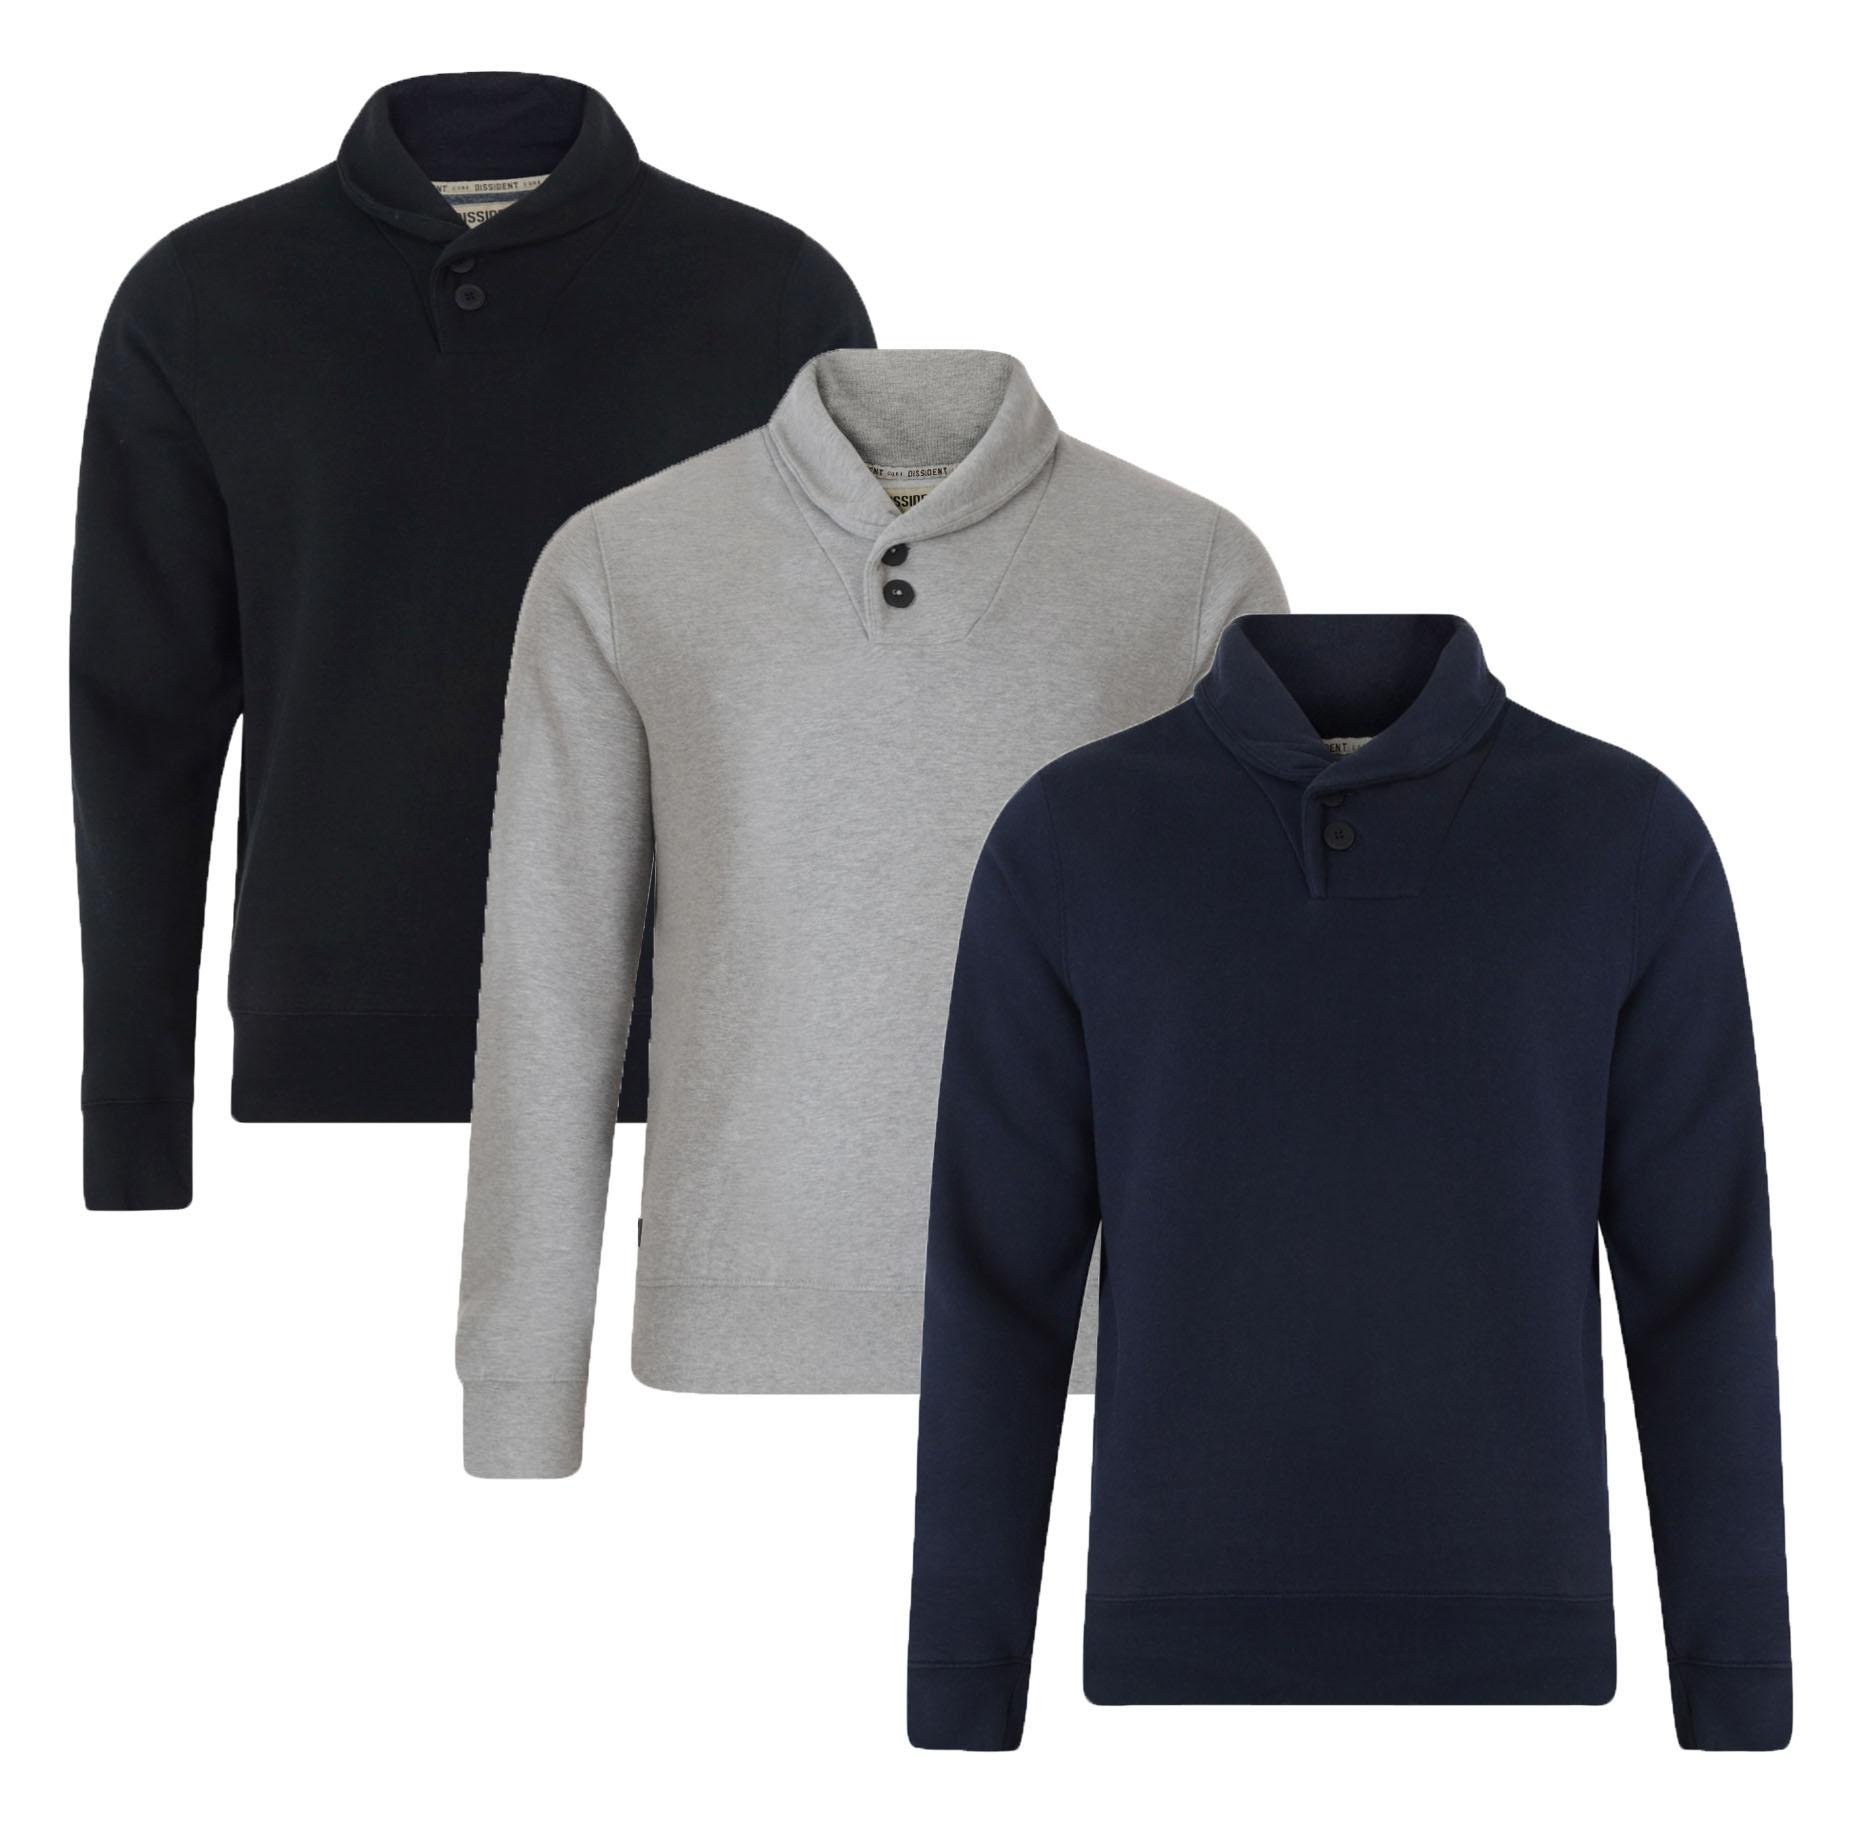 Dissident New Men's Shawl Neck Sweatshirt Black Grey Blue Casual Jumper Top